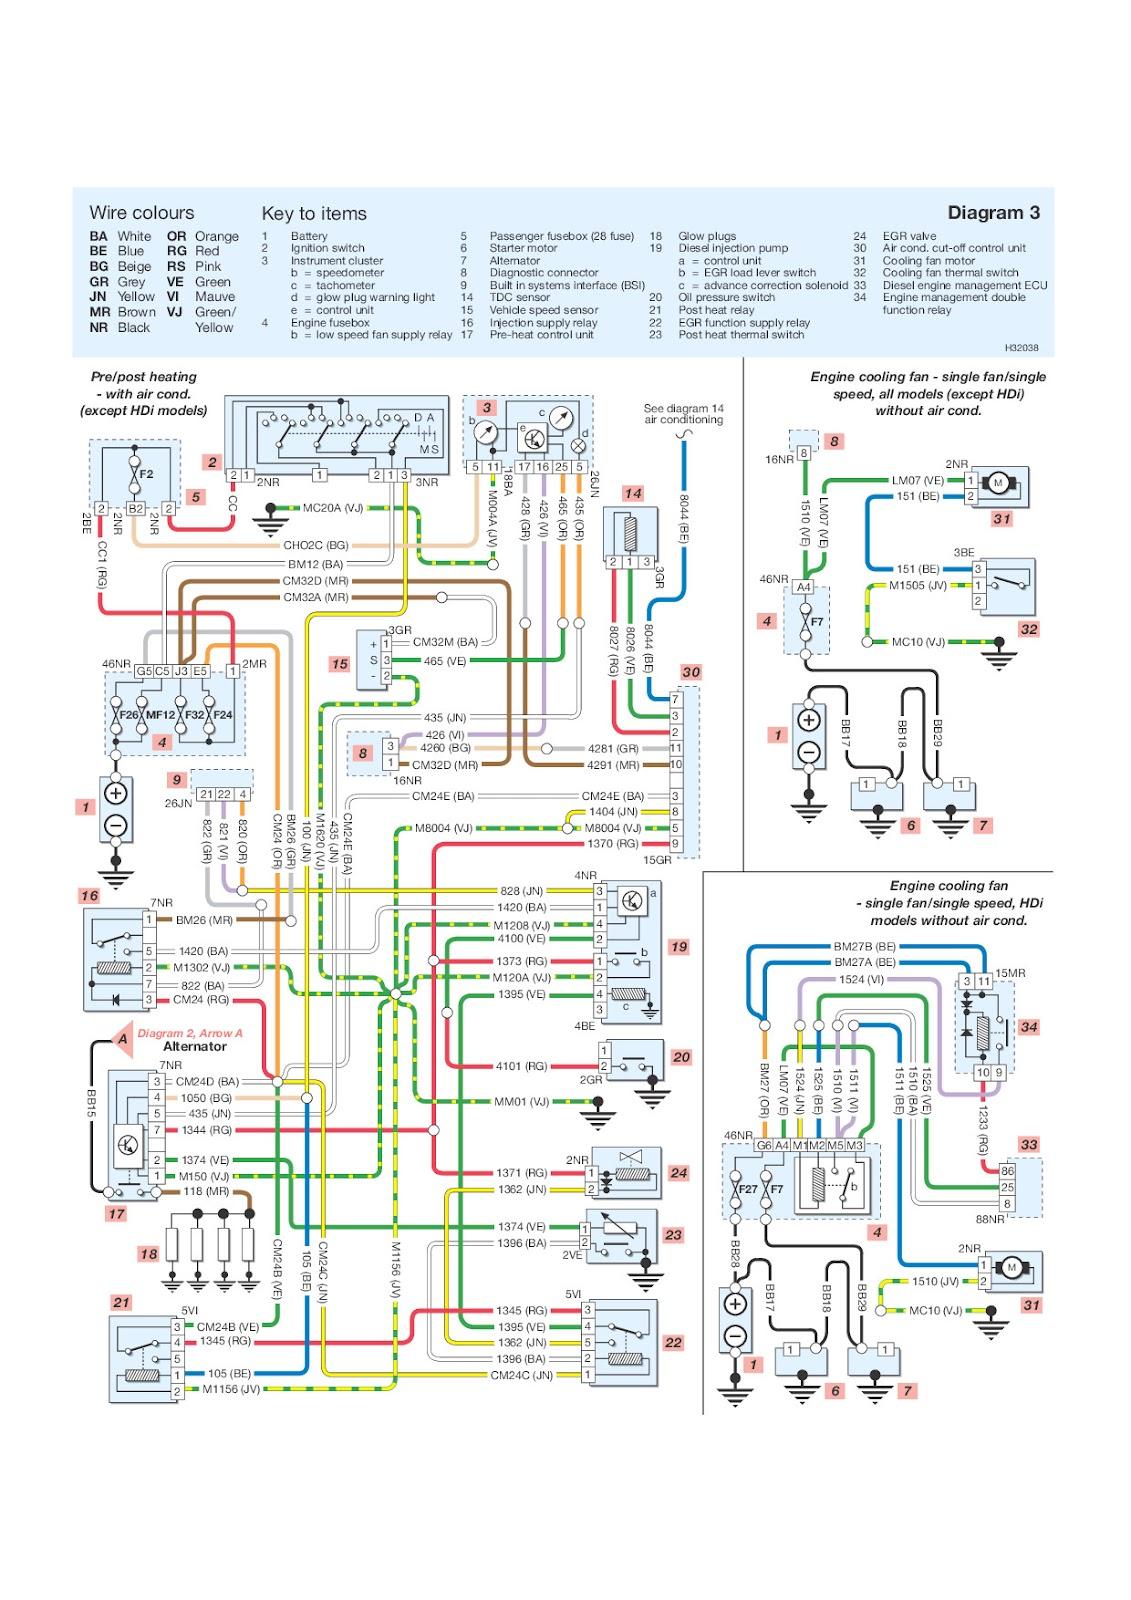 Wondrous Peugeot Wiring Diagram Colour Codes Wiring Library Wiring Cloud Counpengheilarigresichrocarnosporgarnagrebsunhorelemohammedshrineorg